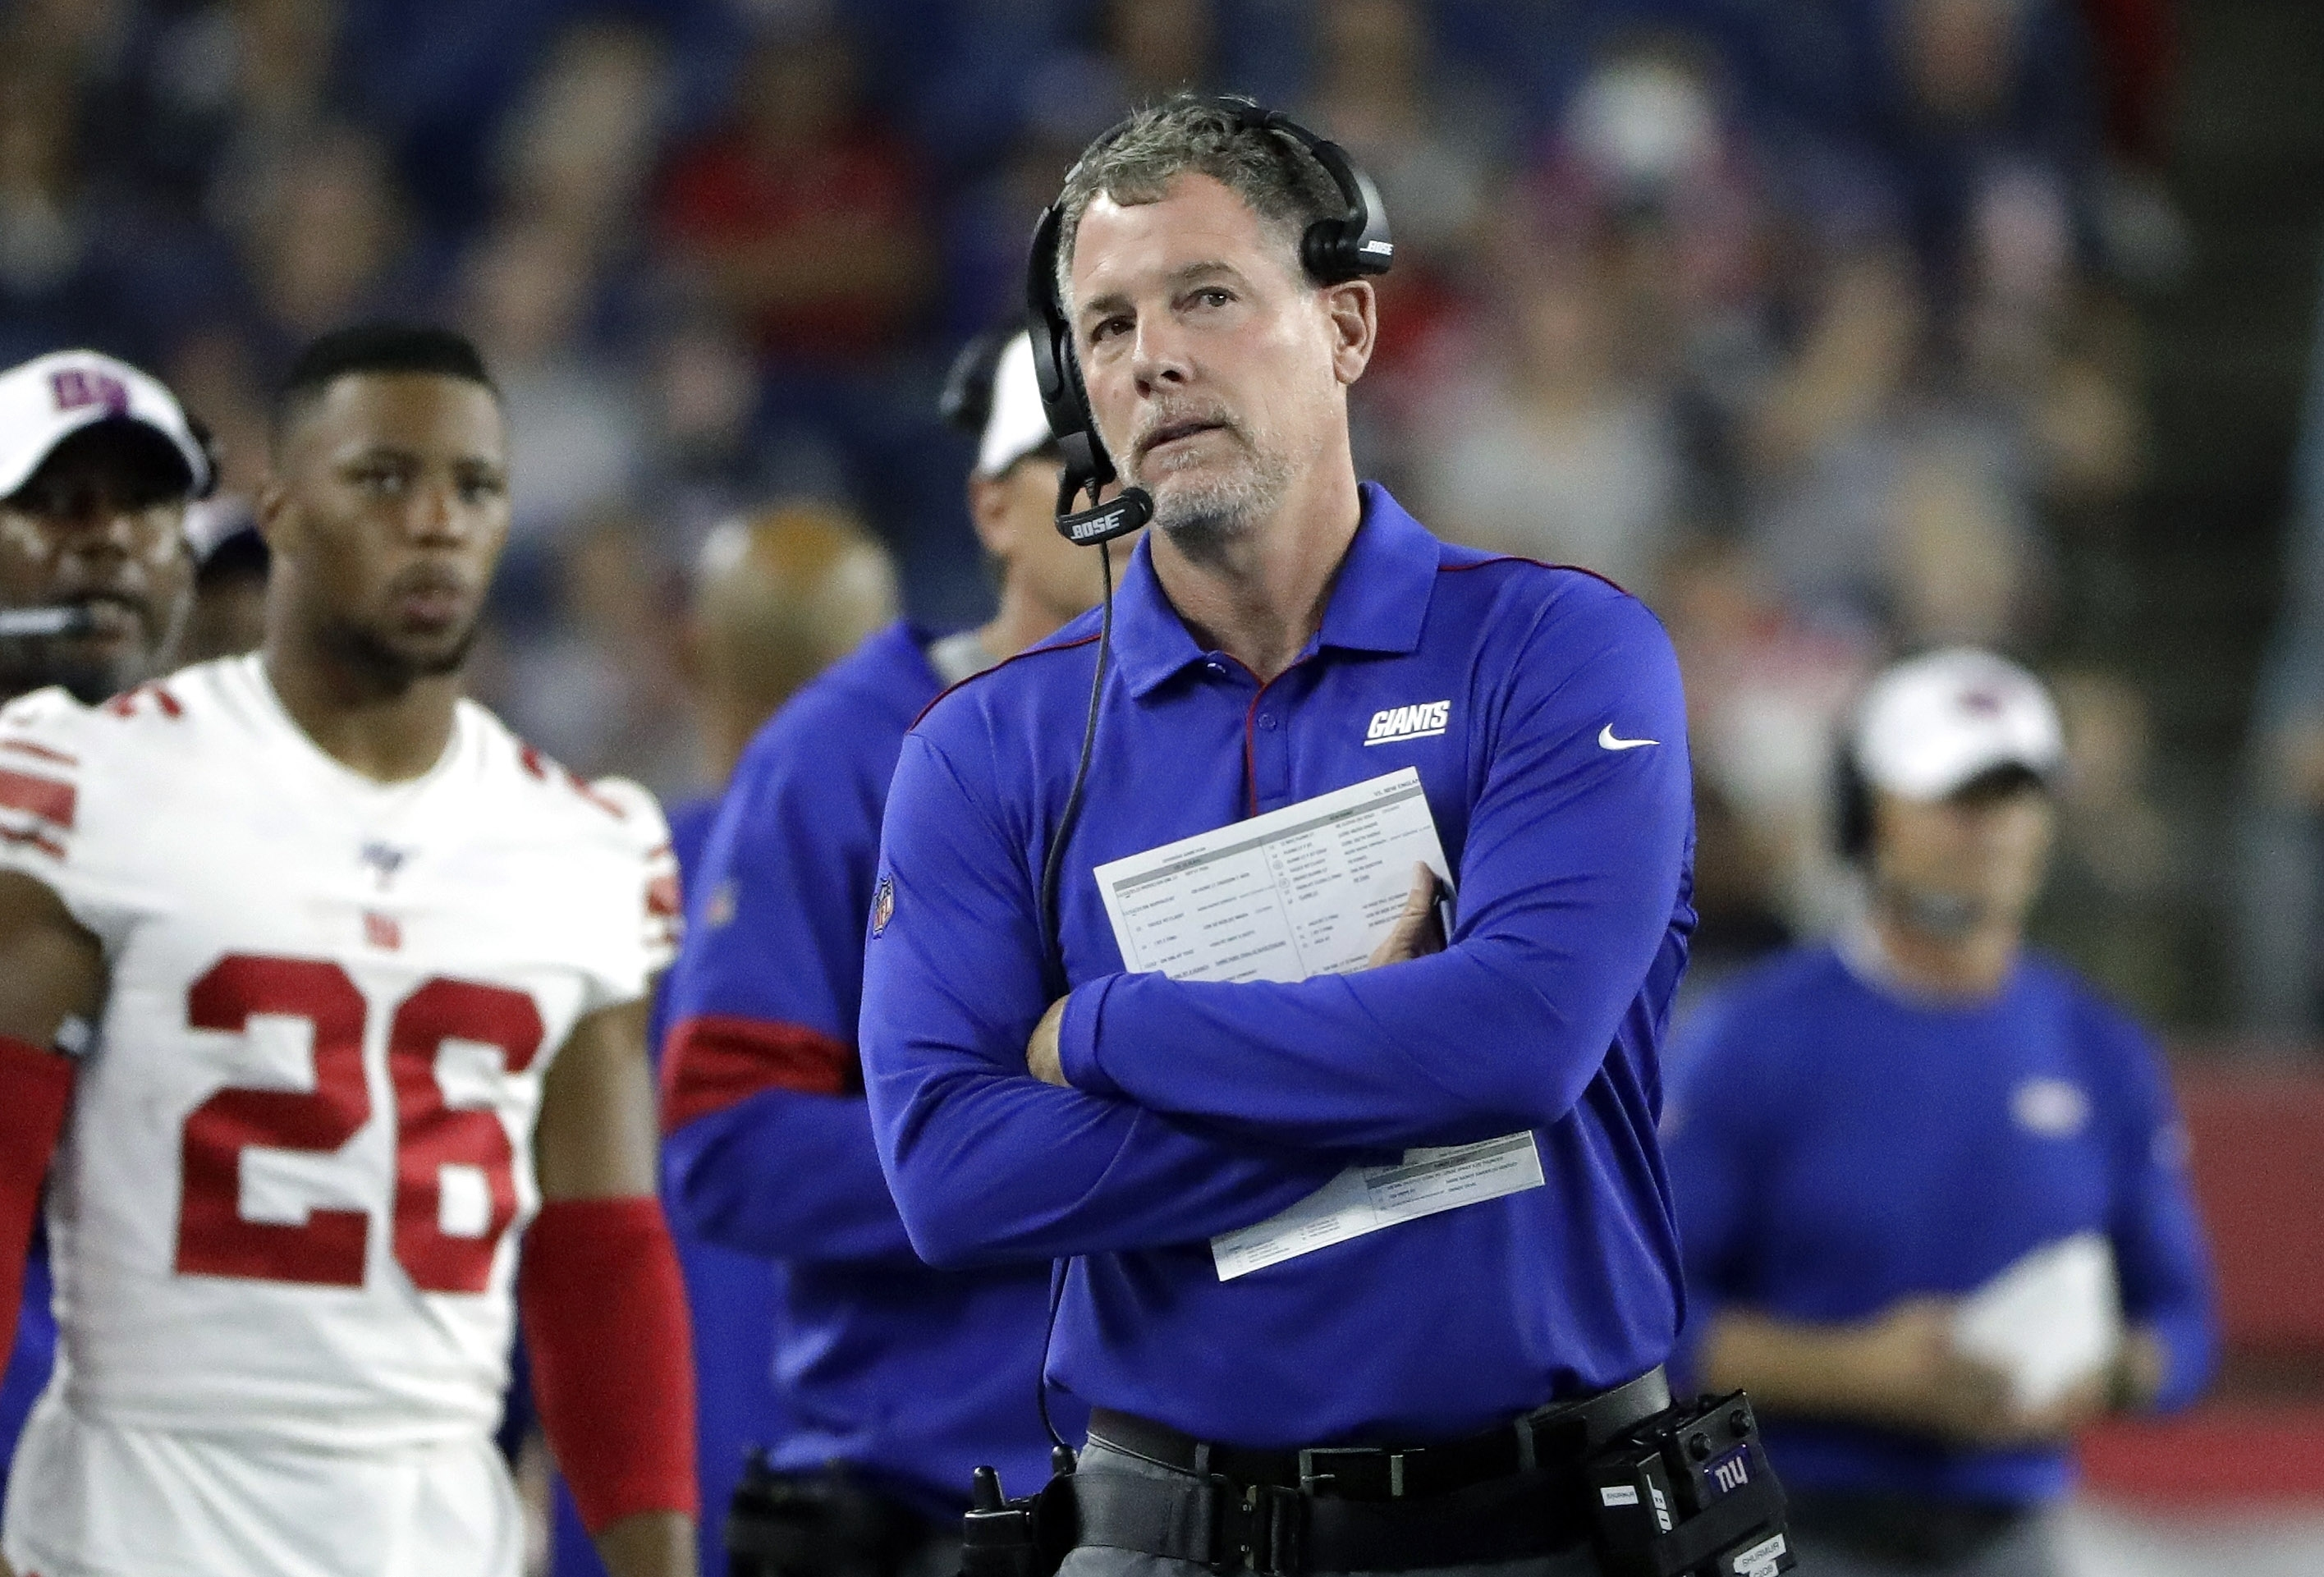 The New York Giants fired head coach Pat Shurmur after two seasons. (AP/Steven Senne)